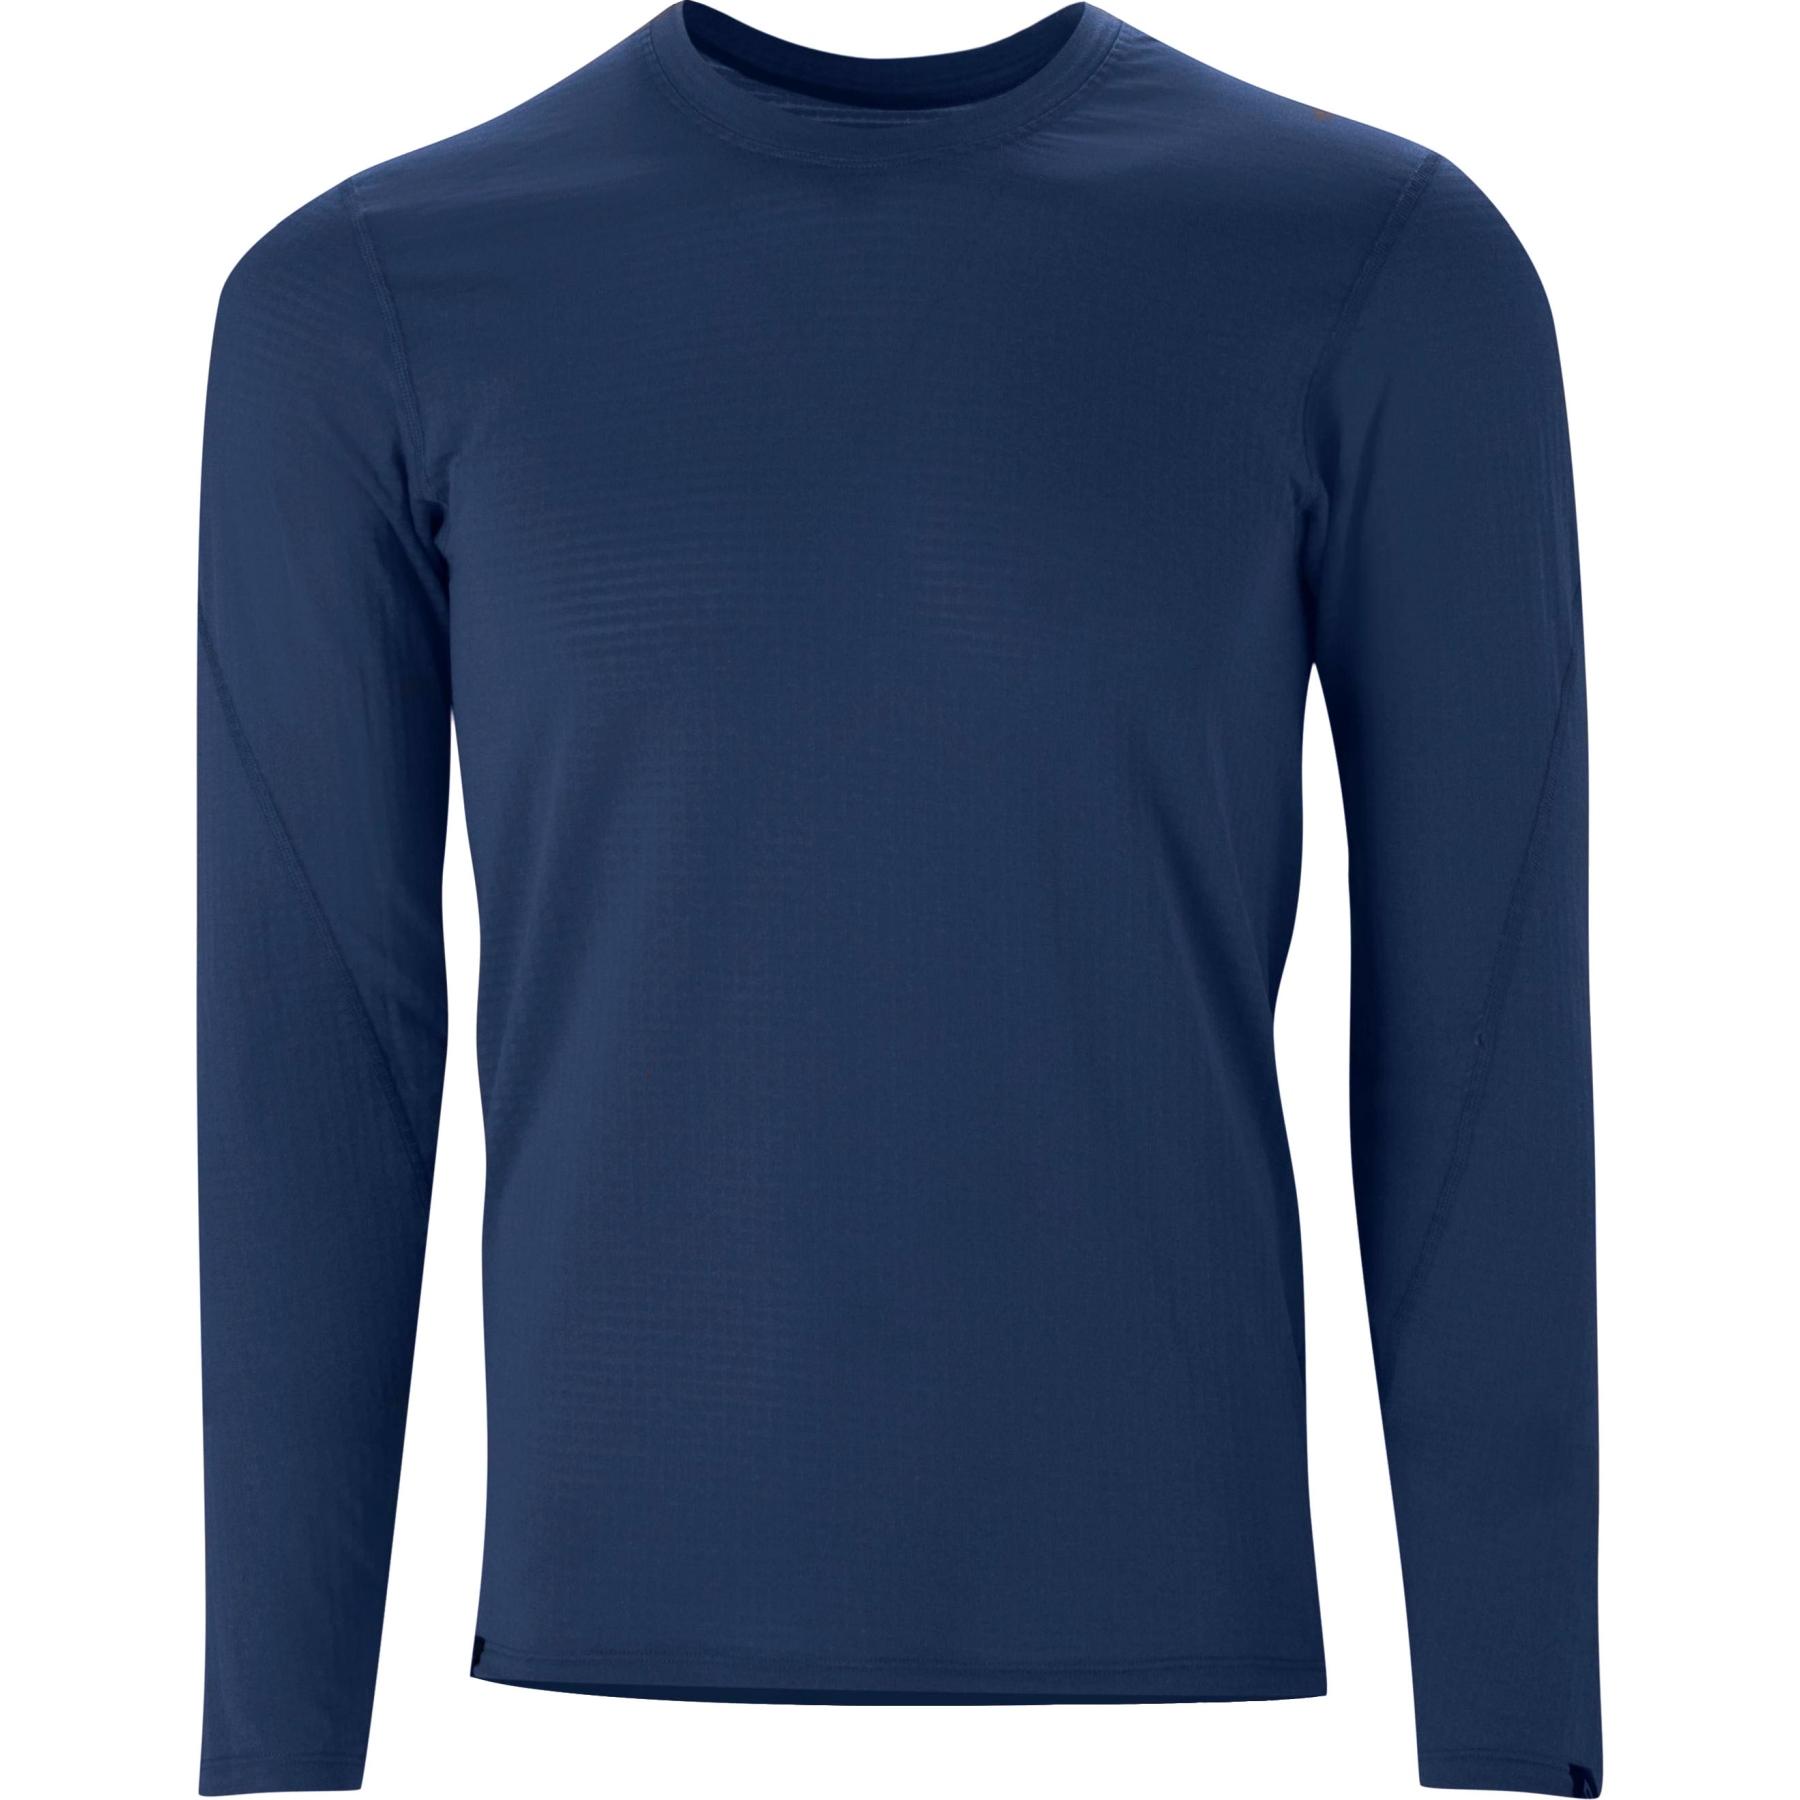 7mesh Gryphon Camiseta de Mangas Largas para Hombre - cadet azul